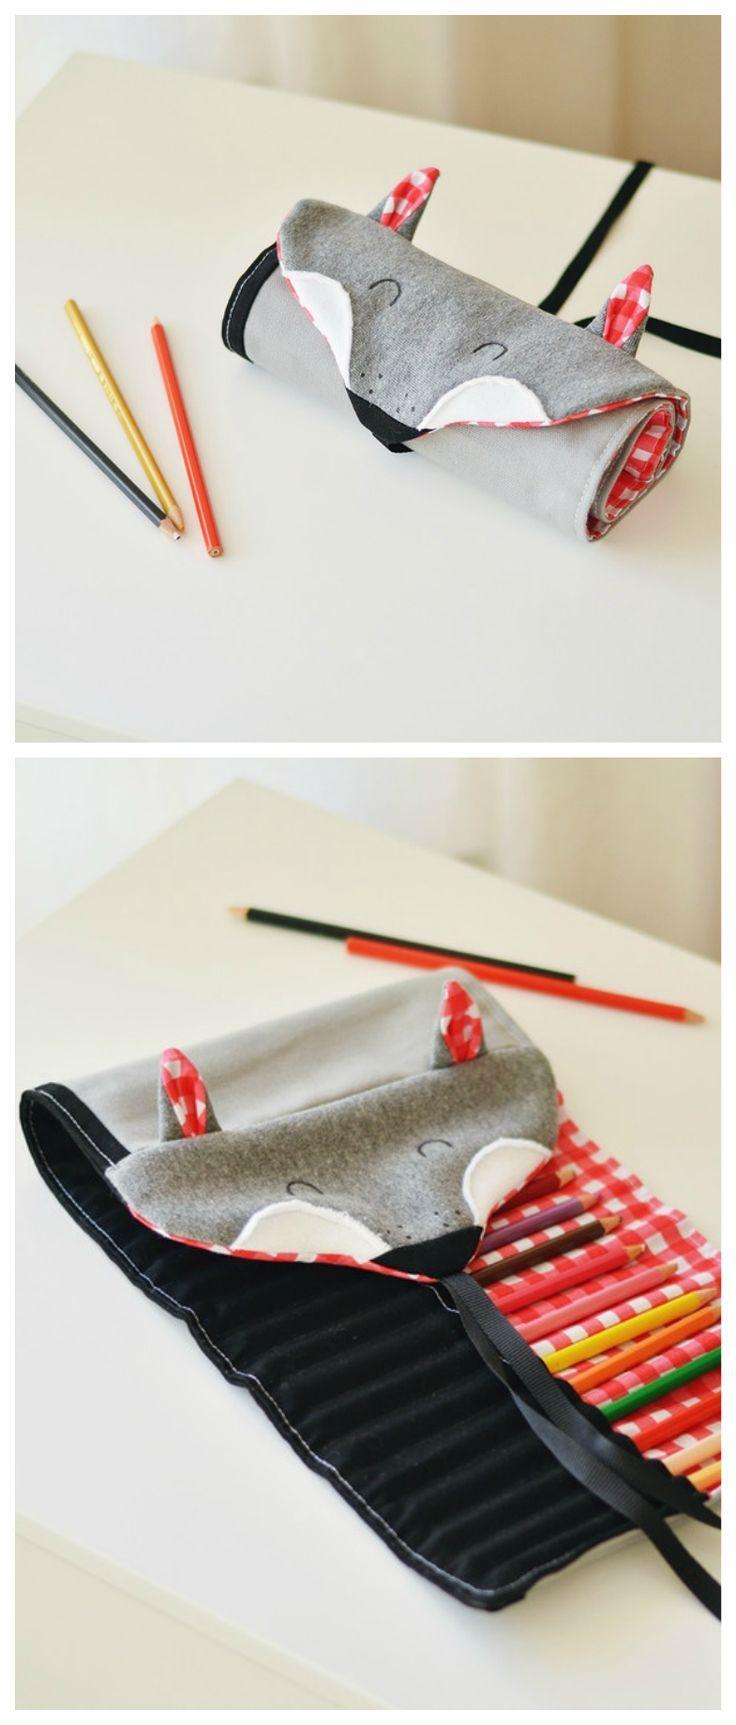 Witzige Stiftemappe für Schulkinder, Geschenk zur Einschulung / funny pencil case for the first day of school, back to school products made by Lady-Stump via DaWanda.com #firstdayofschoolhairstyles